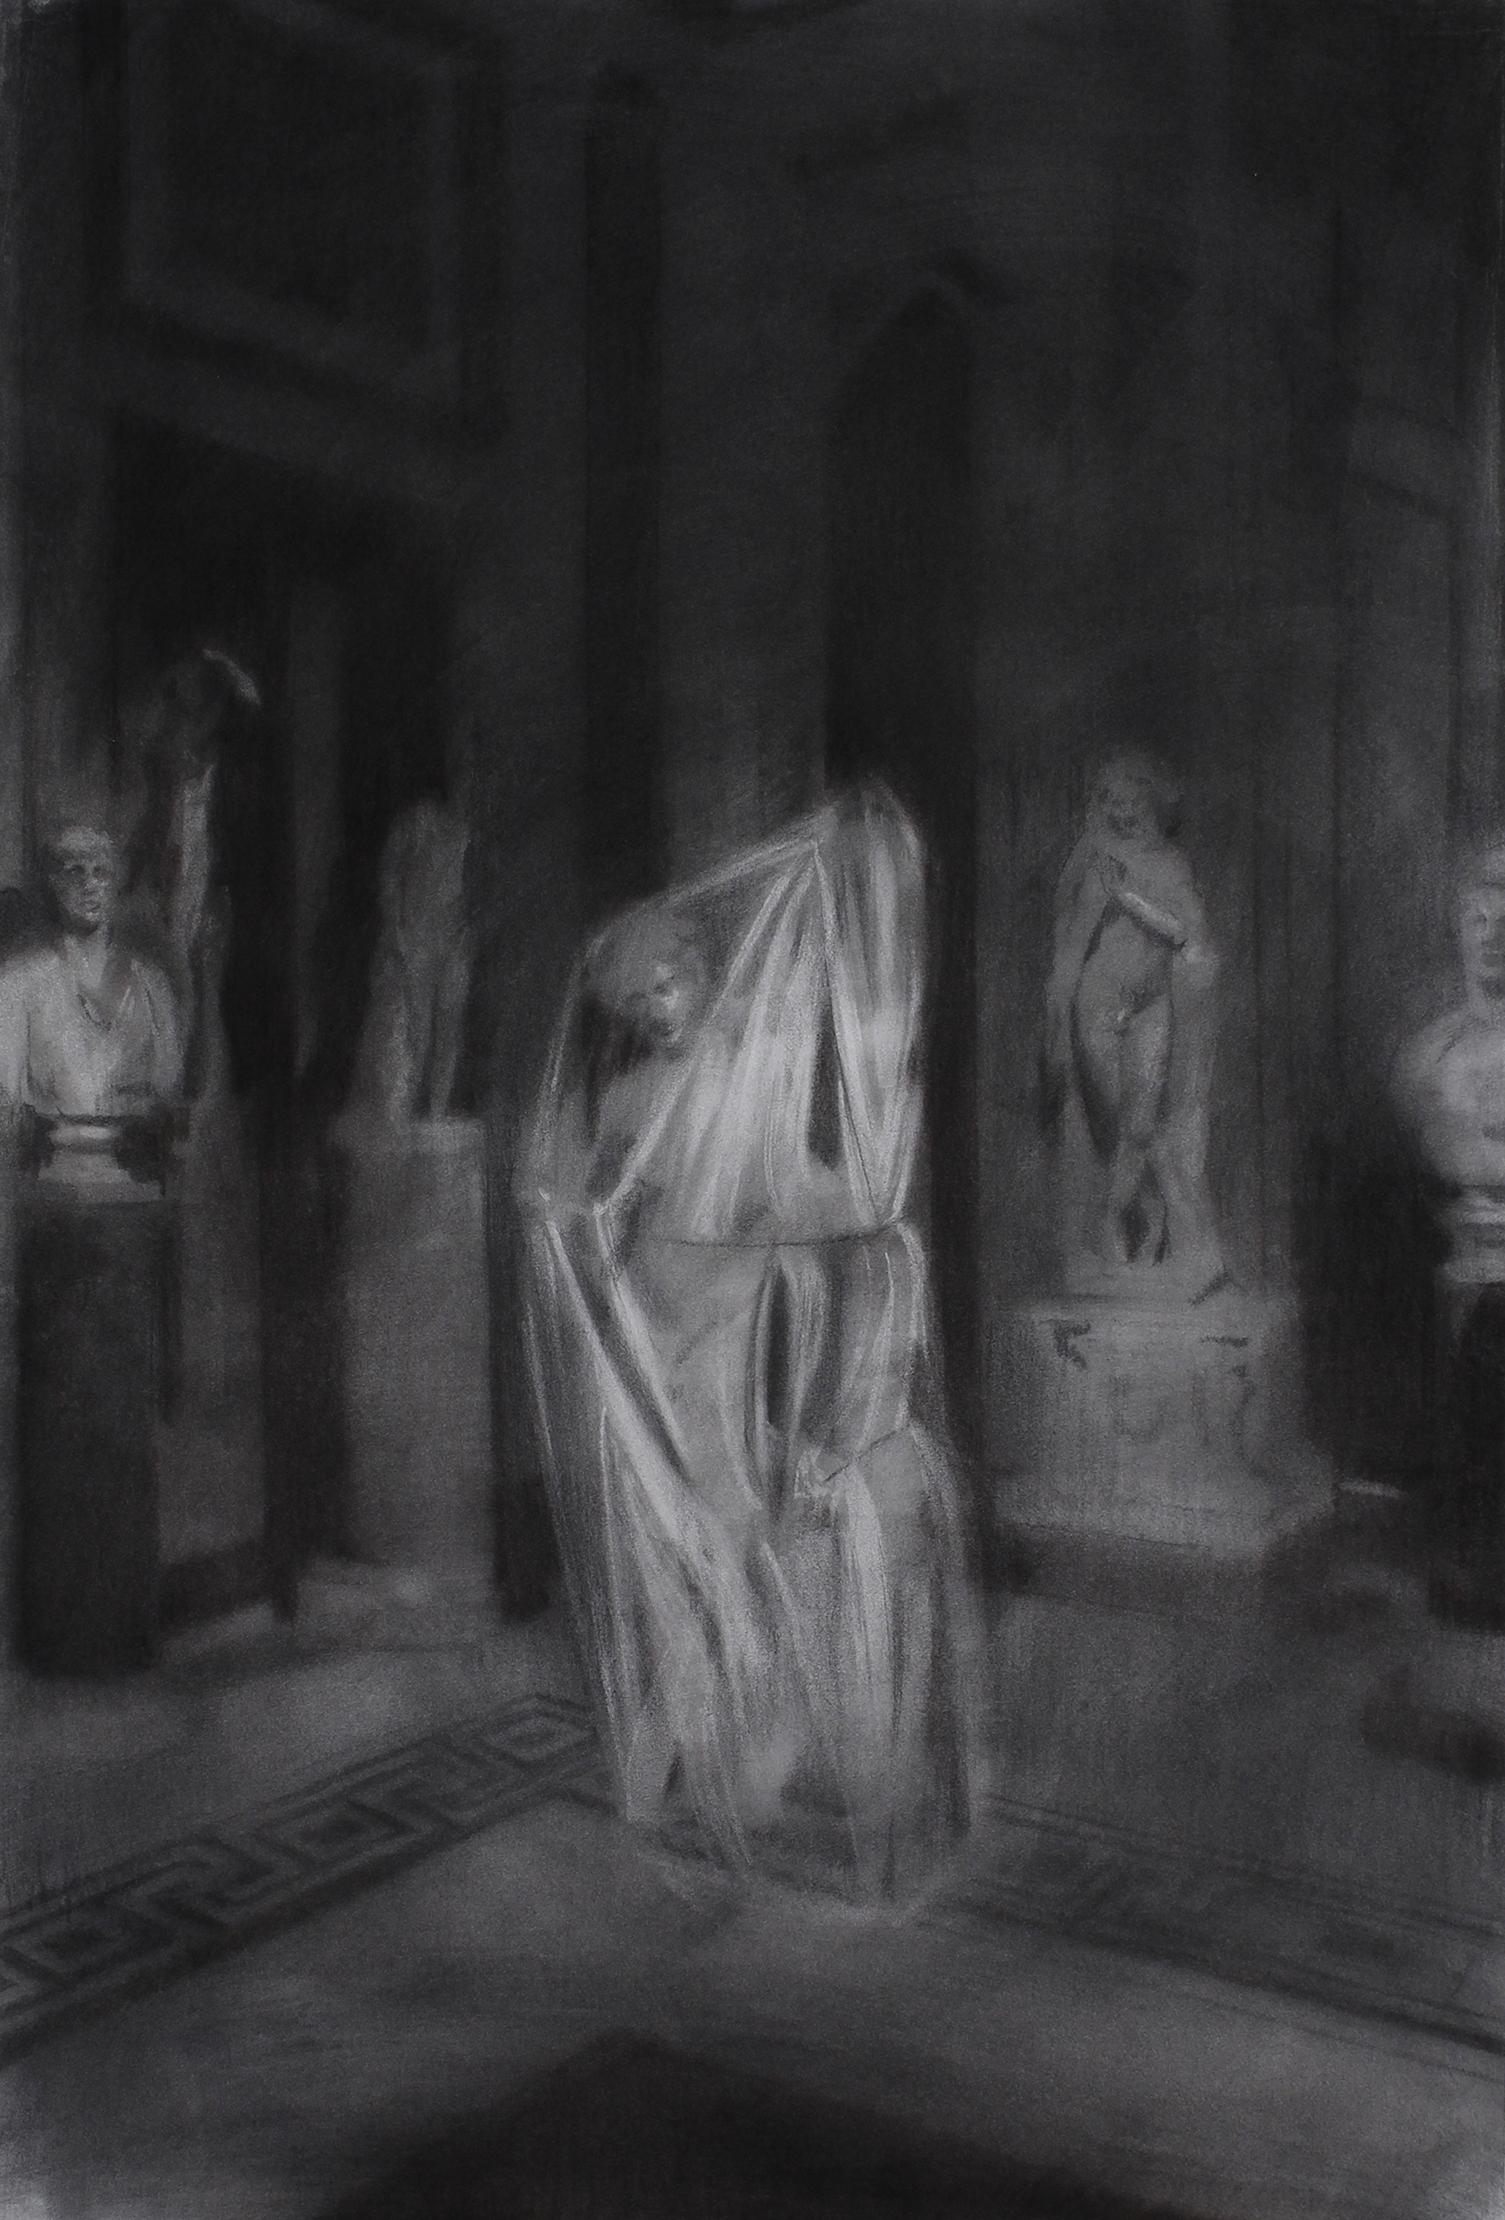 El Apolo Sauróctono regresa a la Villa Borghese. Carboncillo sobre papel. 120 x 70 cm.